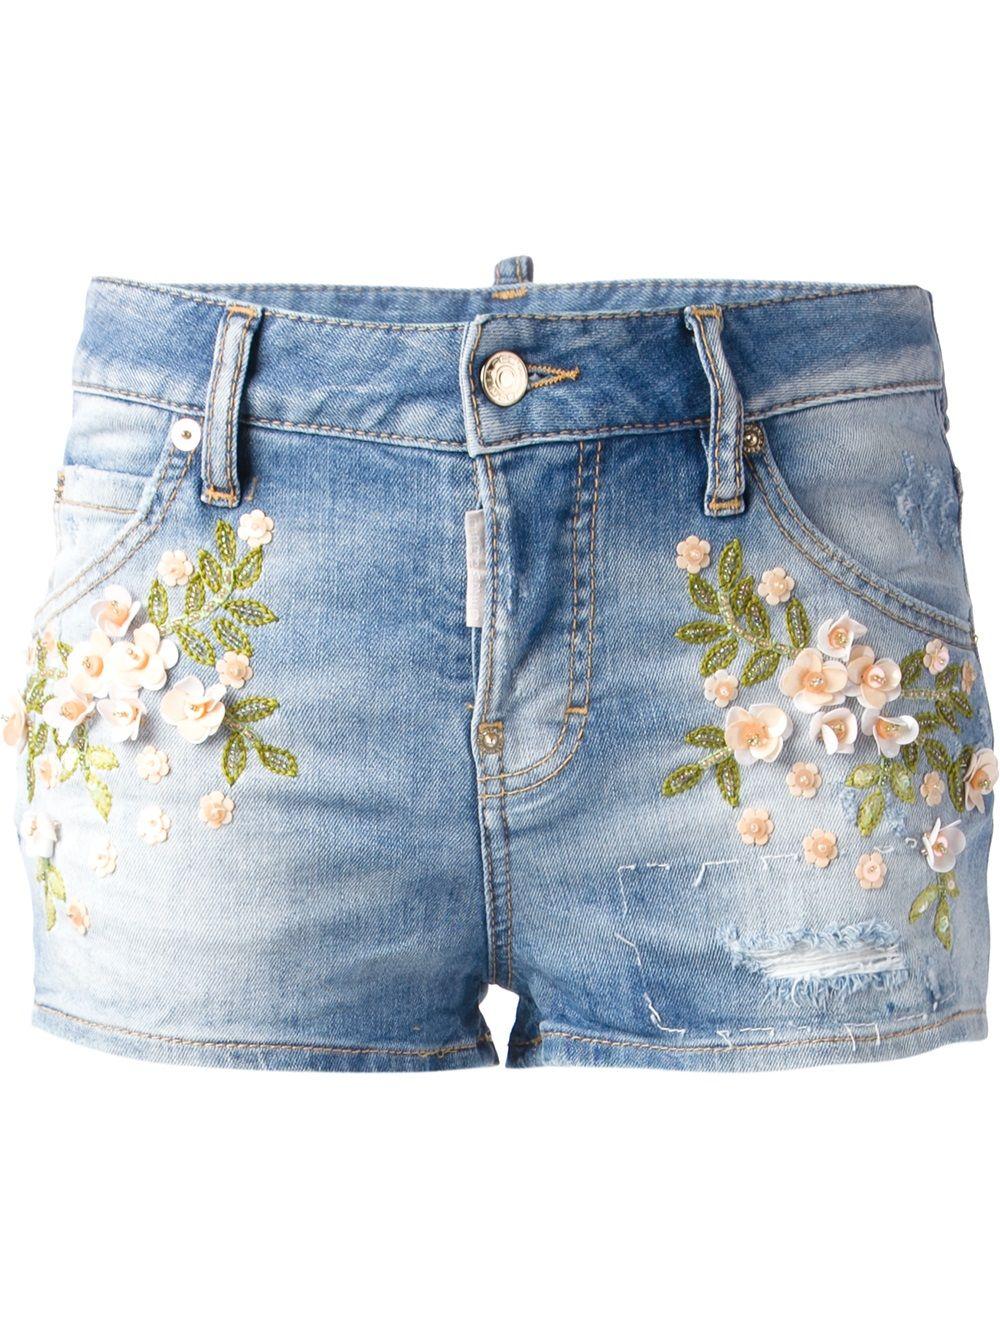 Frayed hole Monogram embroidered denim shorts pants shorts women and three  tide